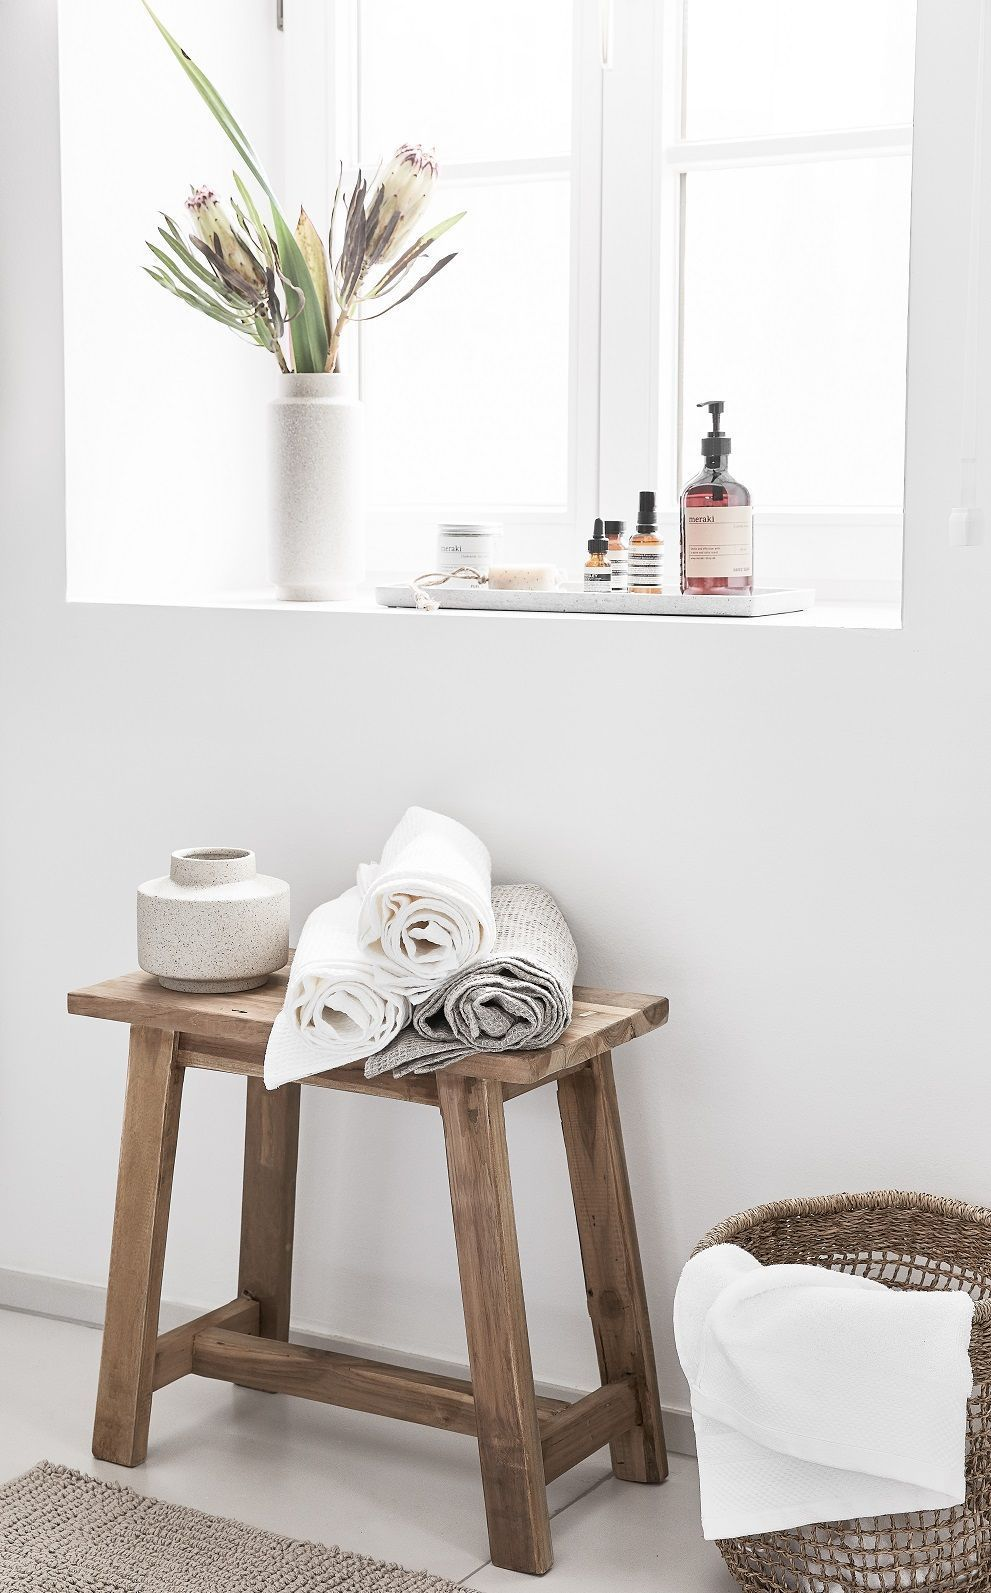 Hocker Lawas Aus Teakholz Mit Bildern Holzhocker Badezimmer Ohne Fenster Hocker Holz